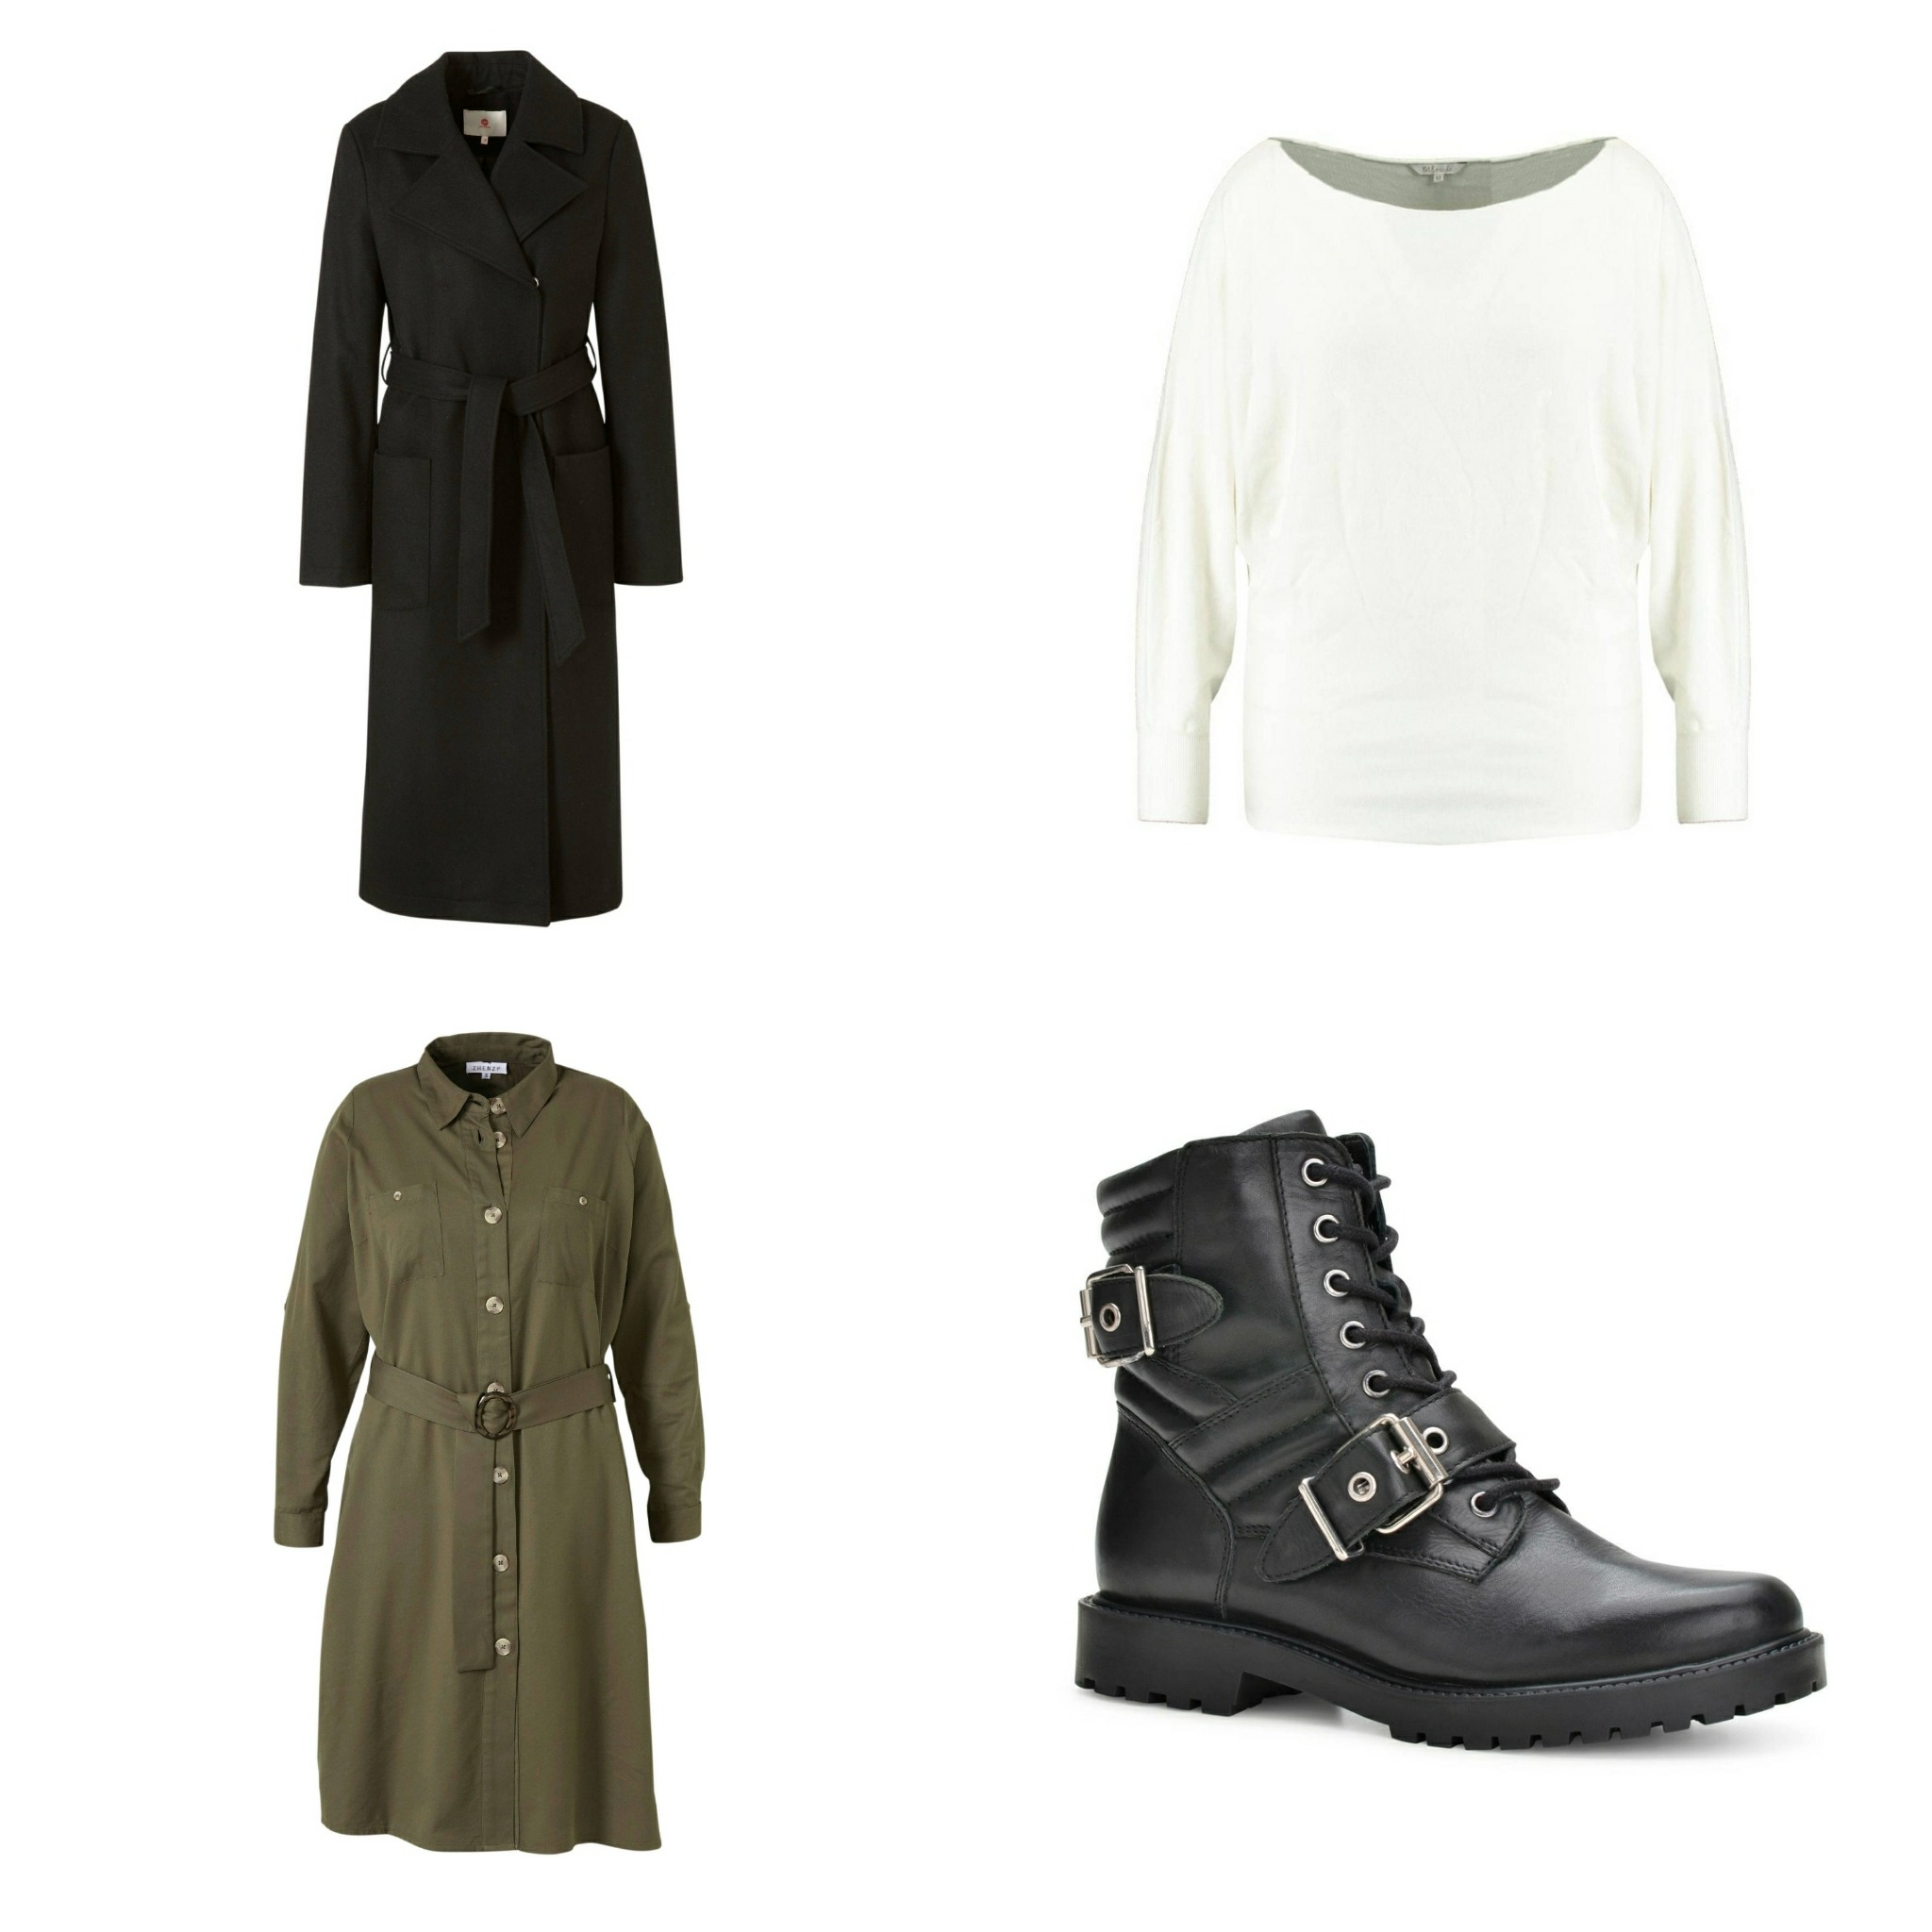 Plus Size Fashion Friday || Sweater weather